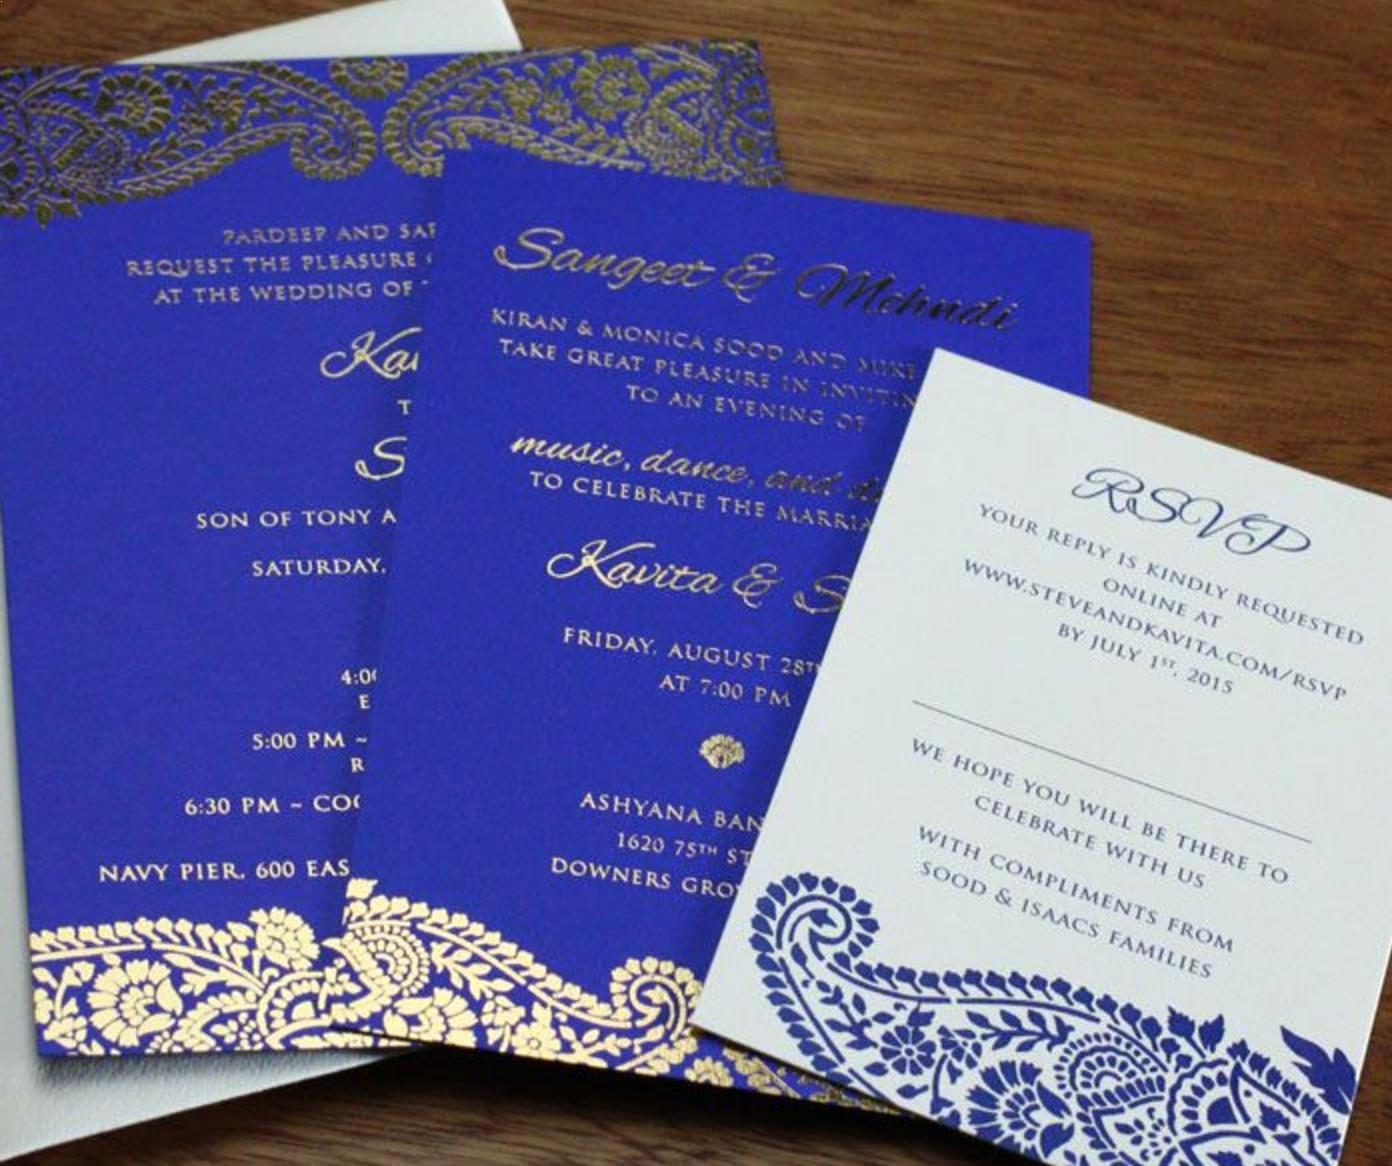 Indian Wedding Invitation Sample Awesome Wedding Invite Templates Indian Wedding Invitation Blank